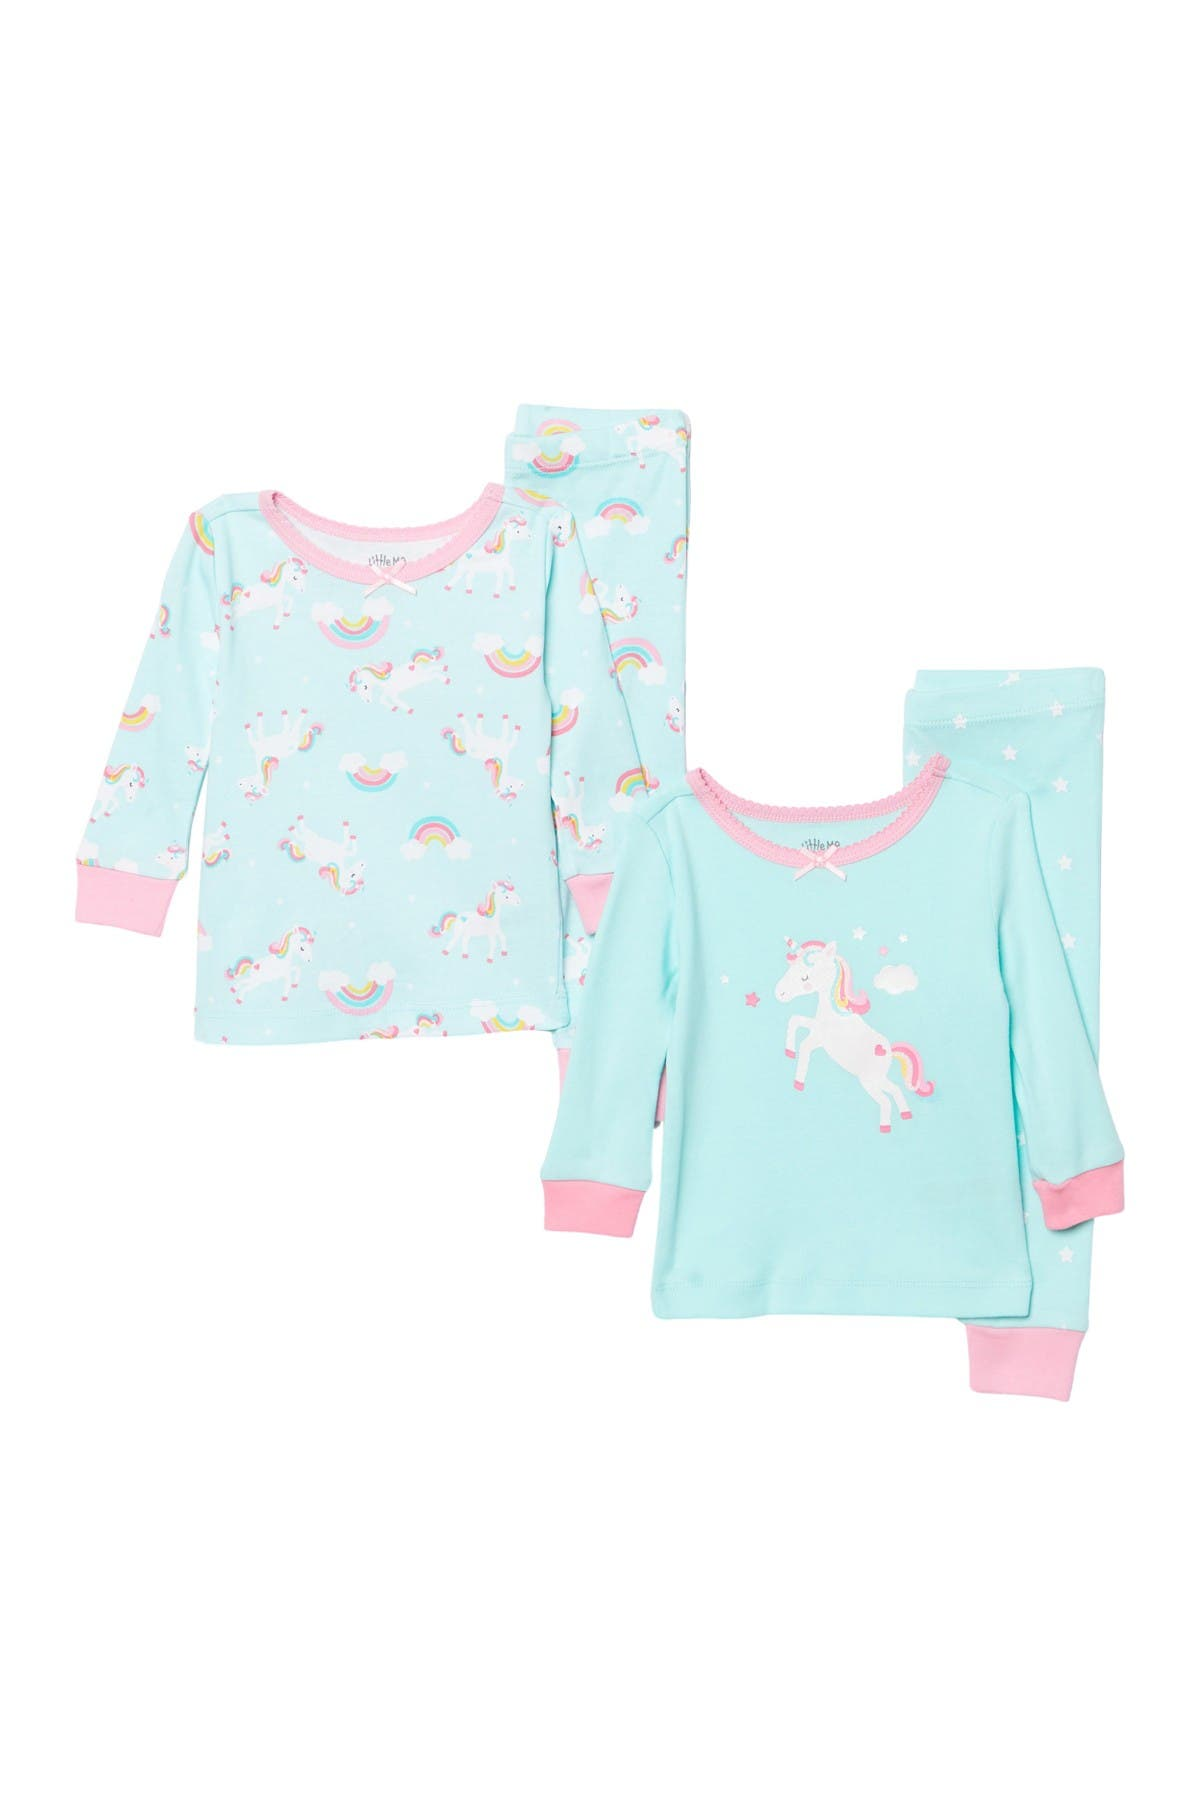 Image of Little Me Unicorn 4 Piece Pajama Set